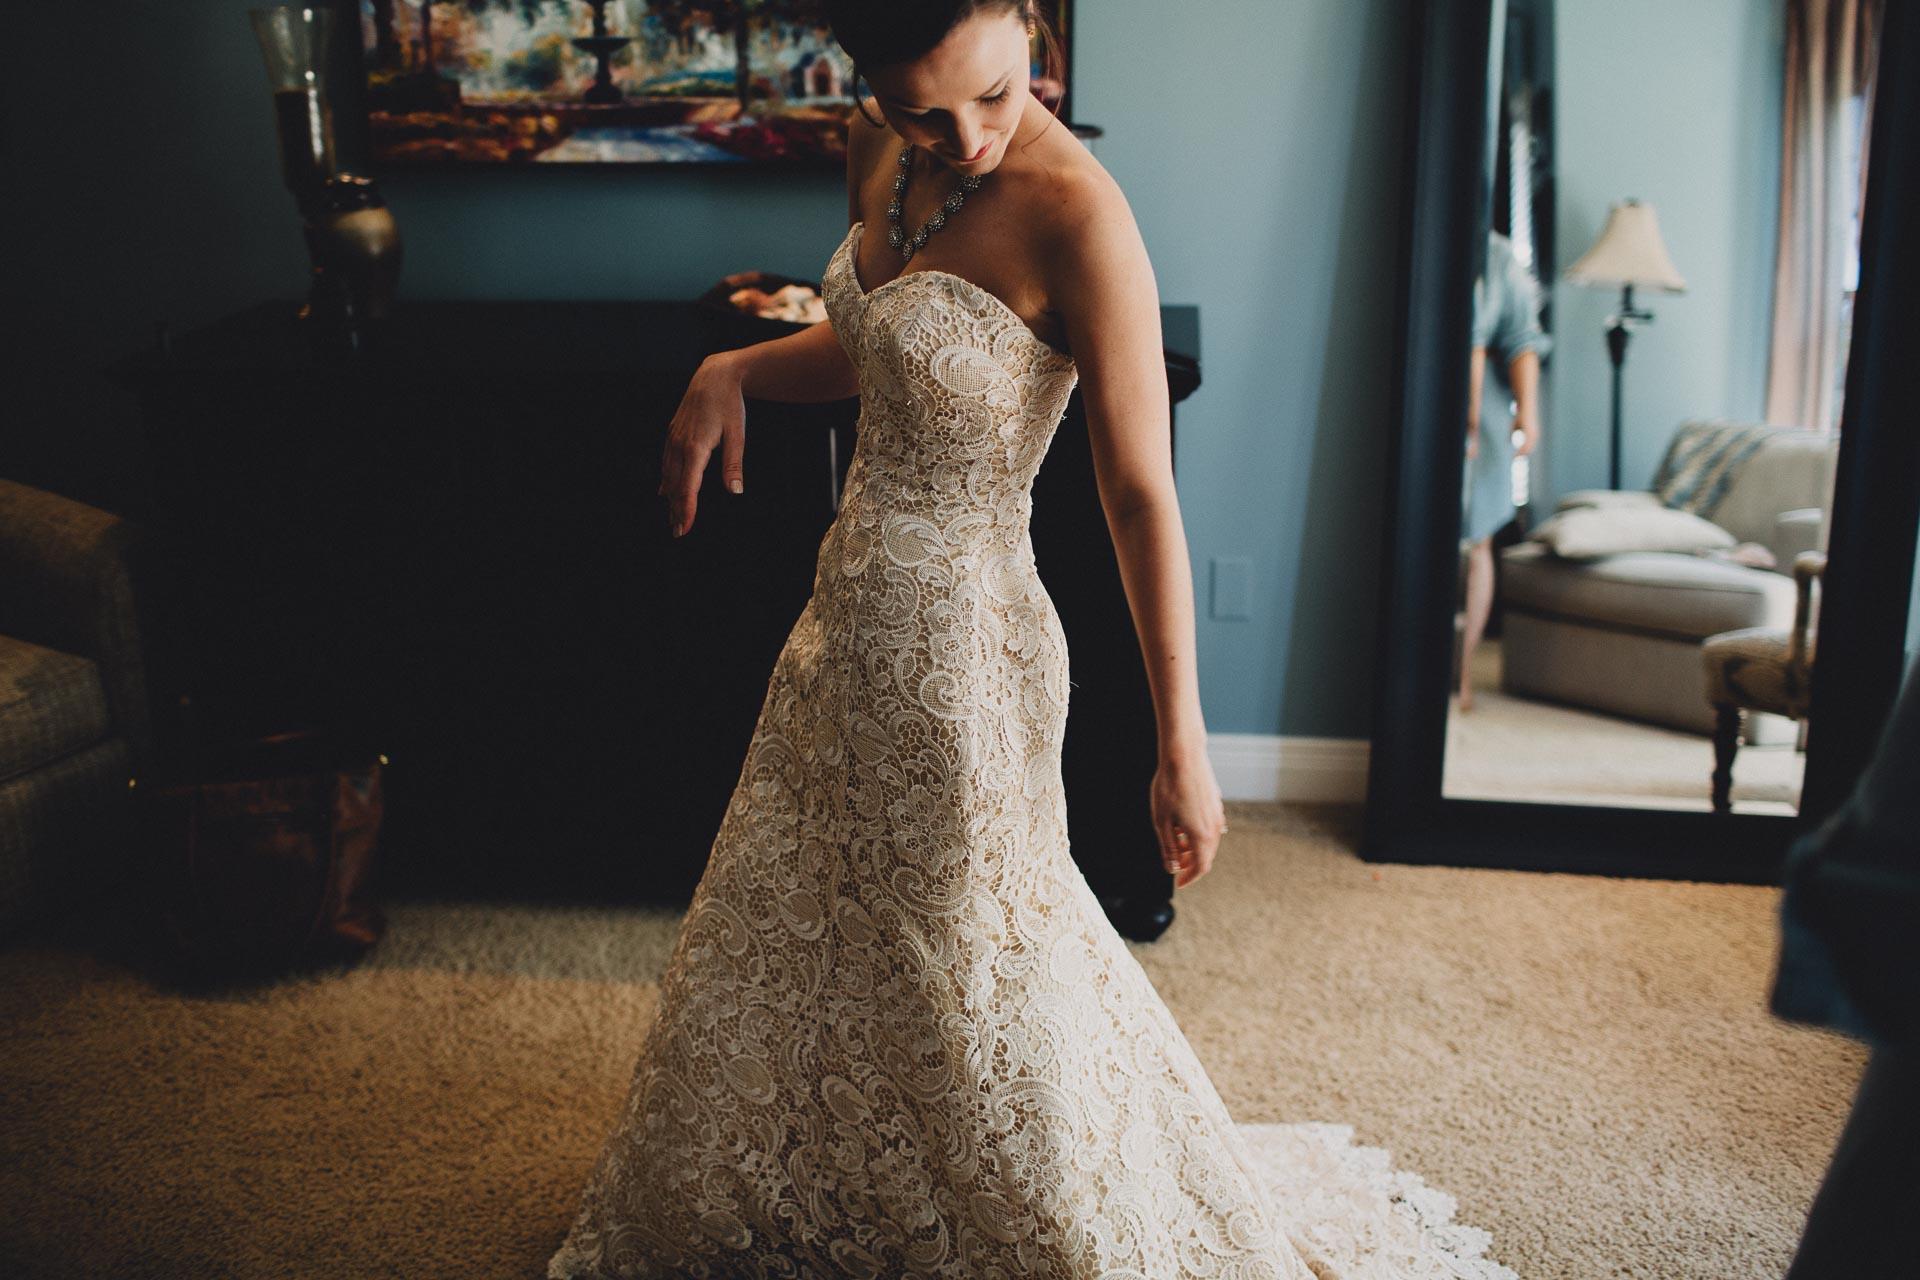 Julia-Michael-Cincinnati-Music-Hall-Wedding-023@2x.jpg